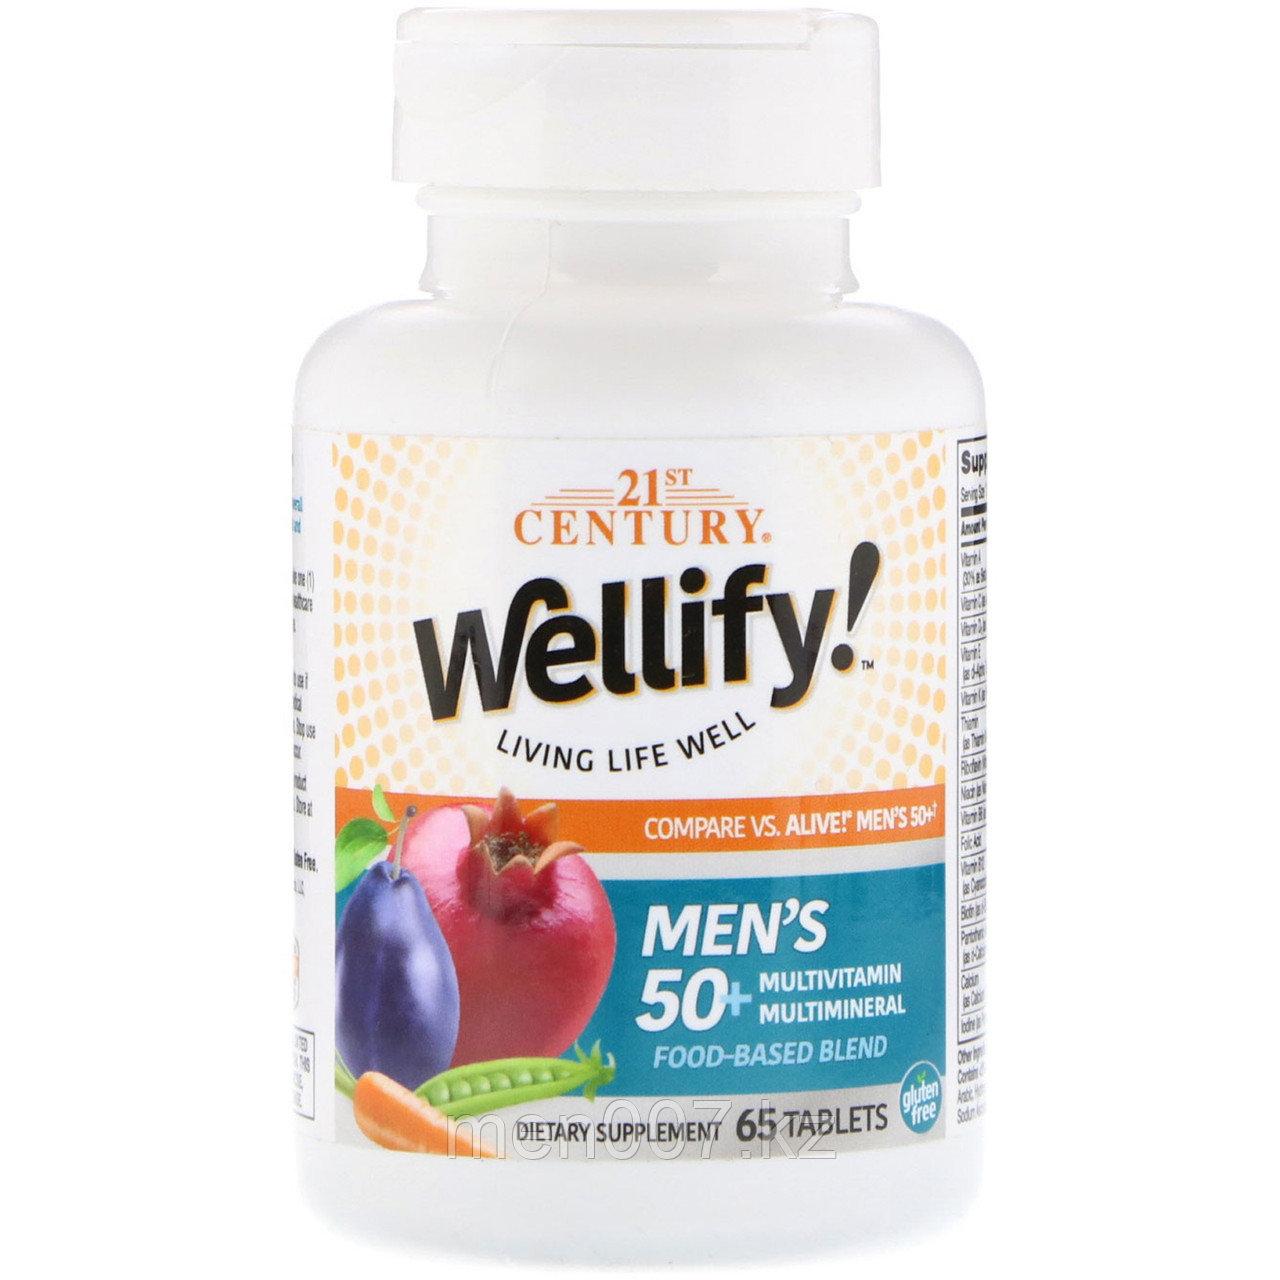 Мультивитамины для мужчин старше 50 лет Wellify! от 21 century США (65 таблеток)